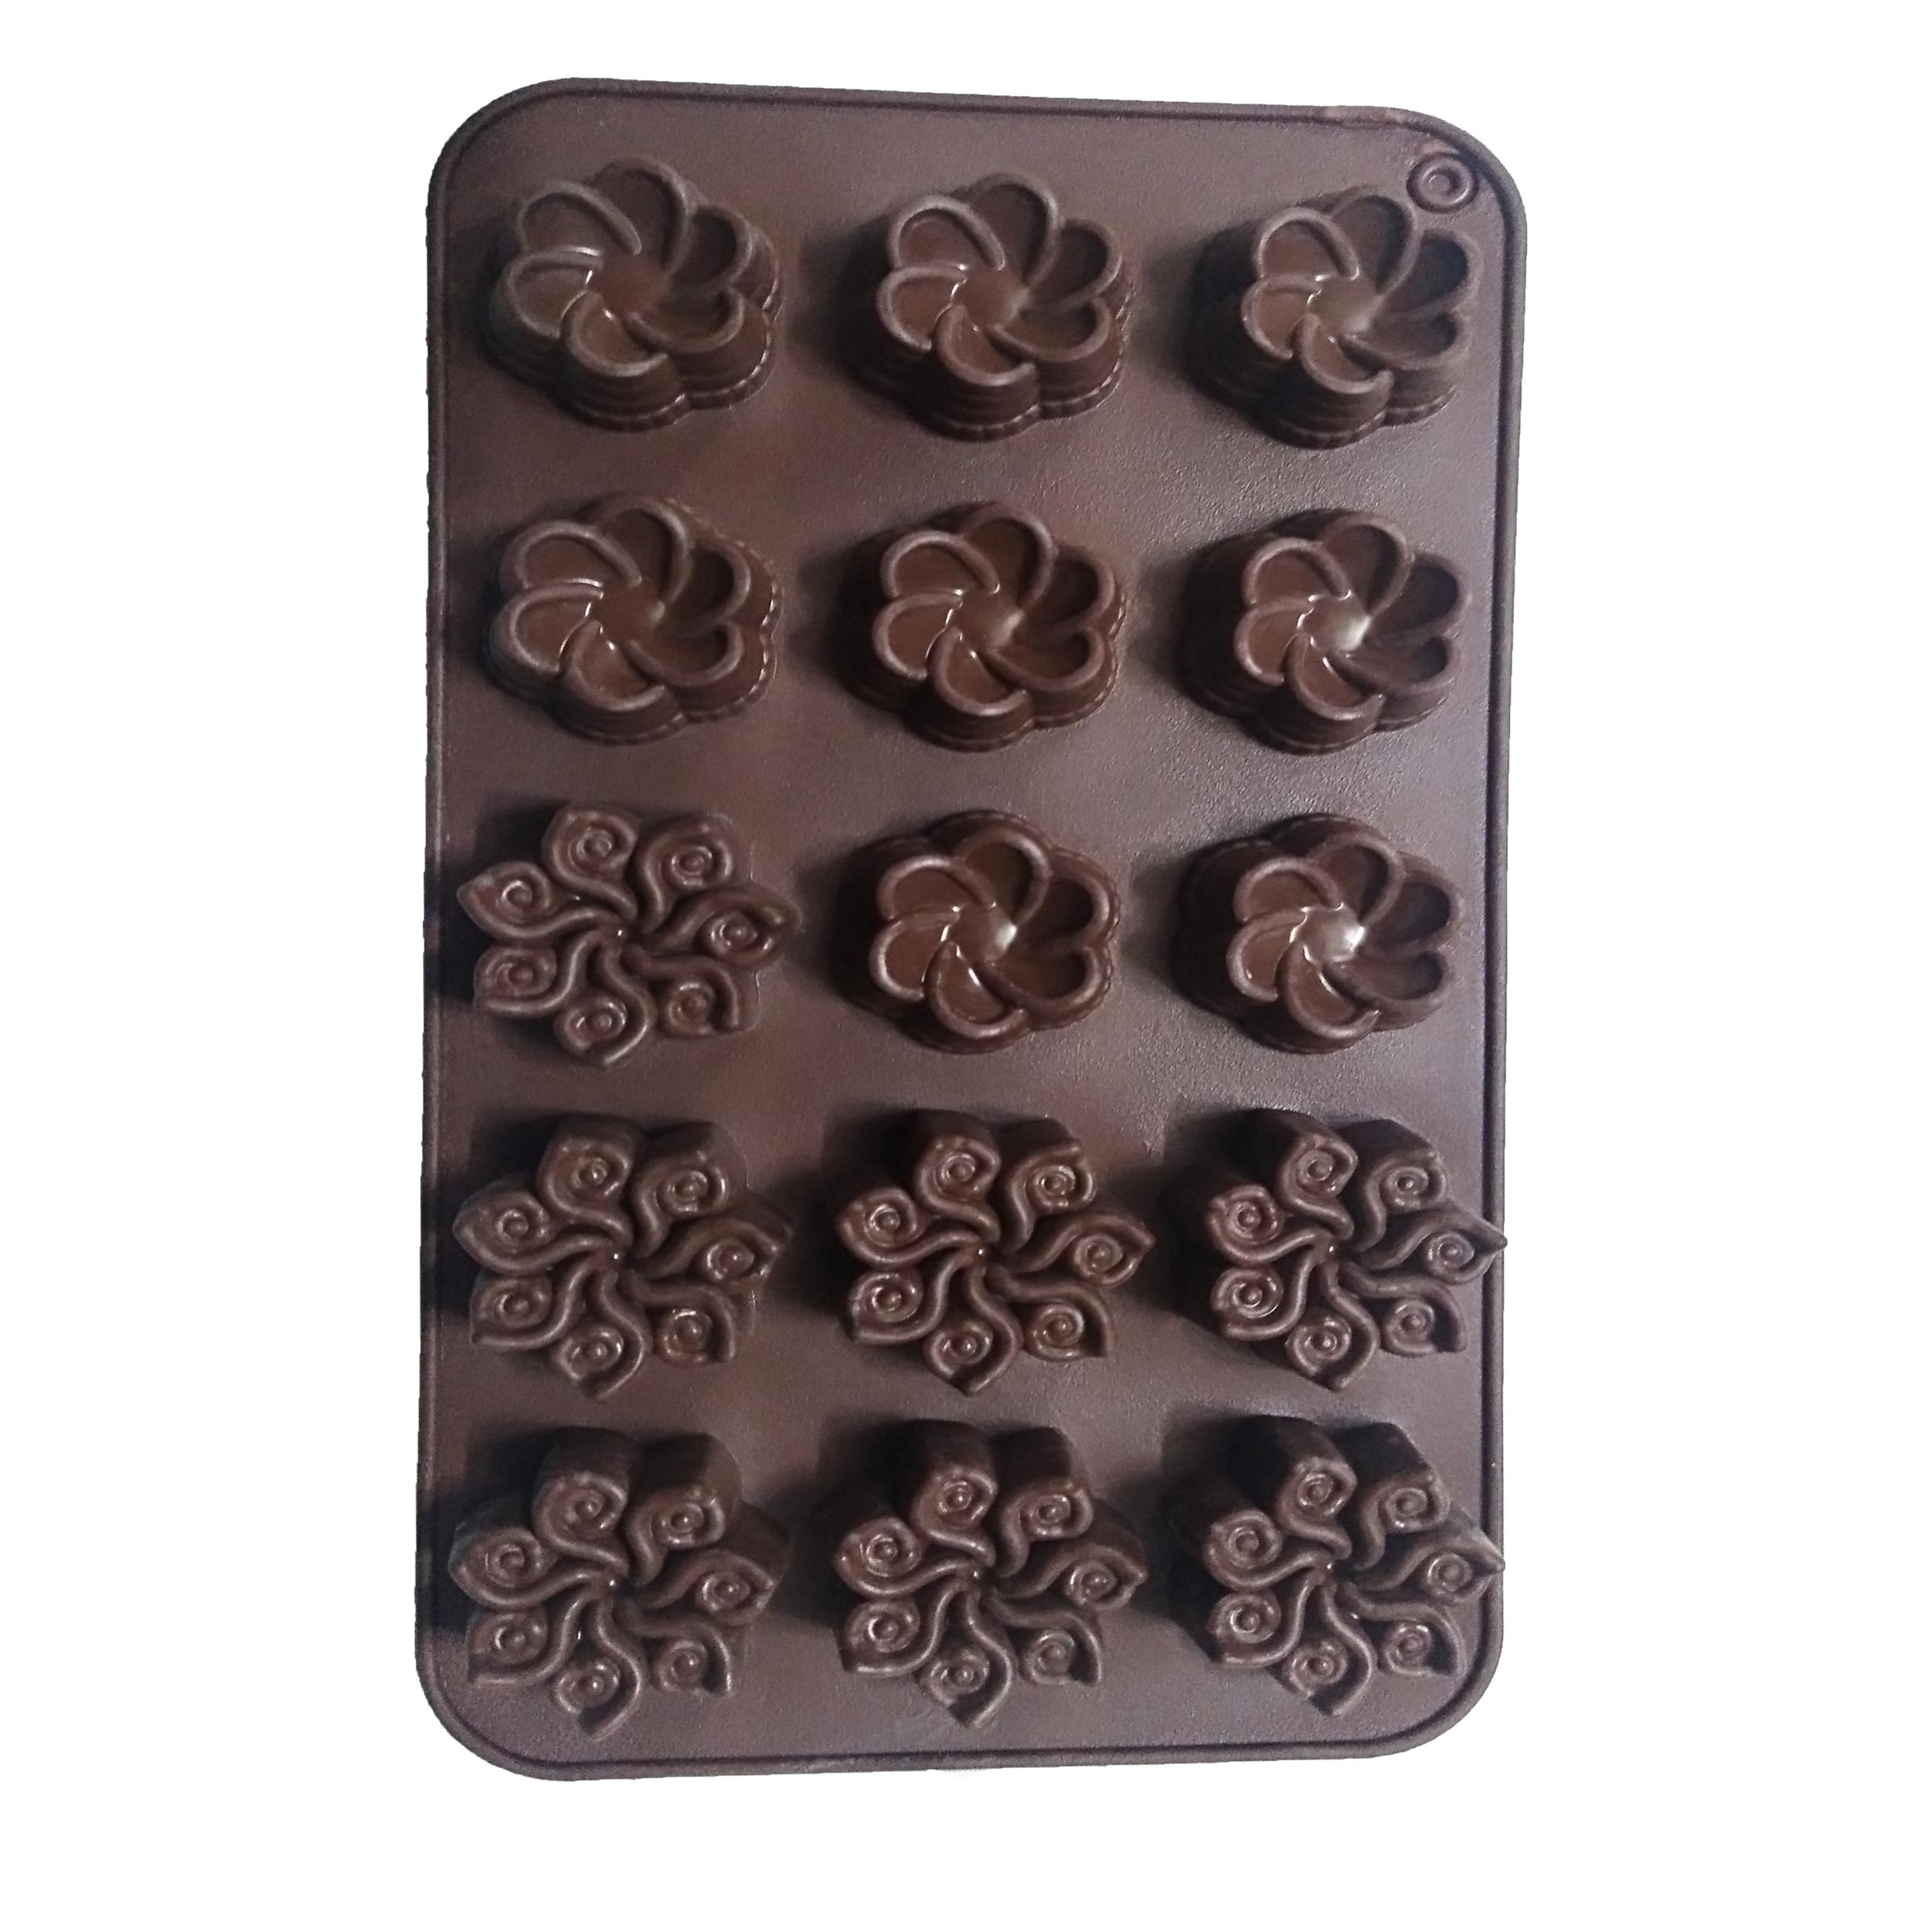 قالب شکلات طرح گل کد n02